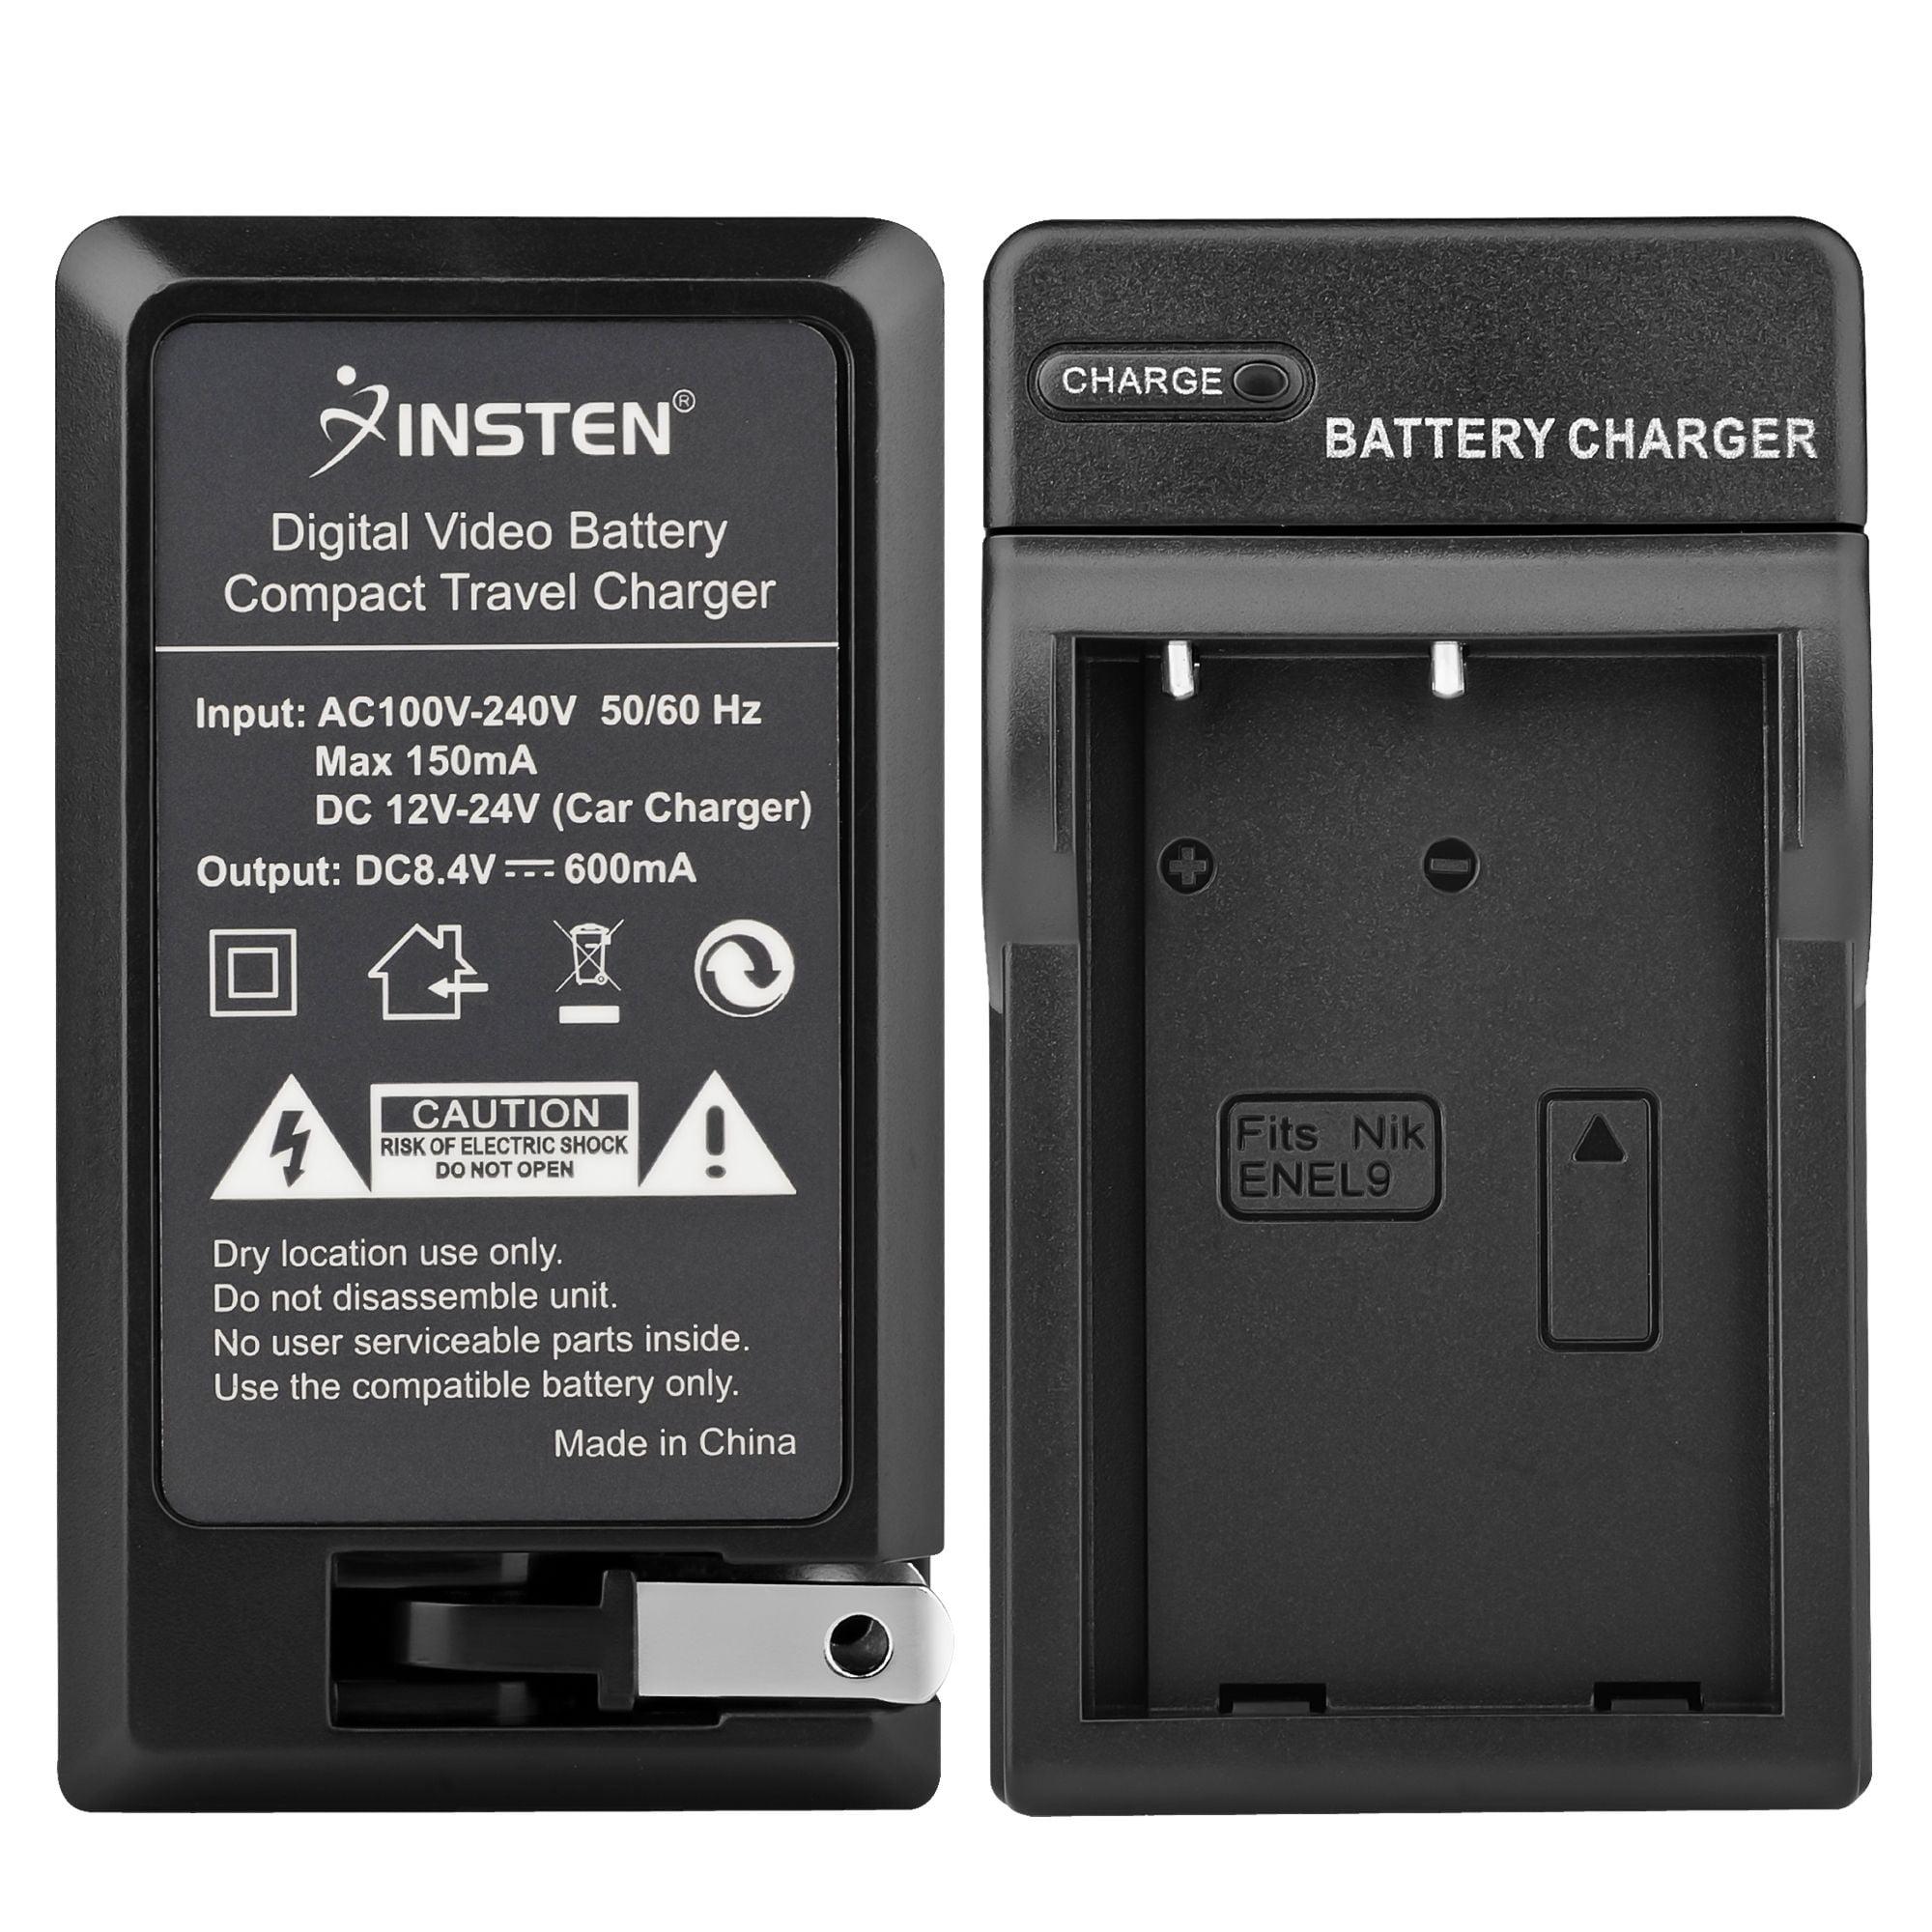 Insten Compact Battery Charger Set For Nikon EN-EL9